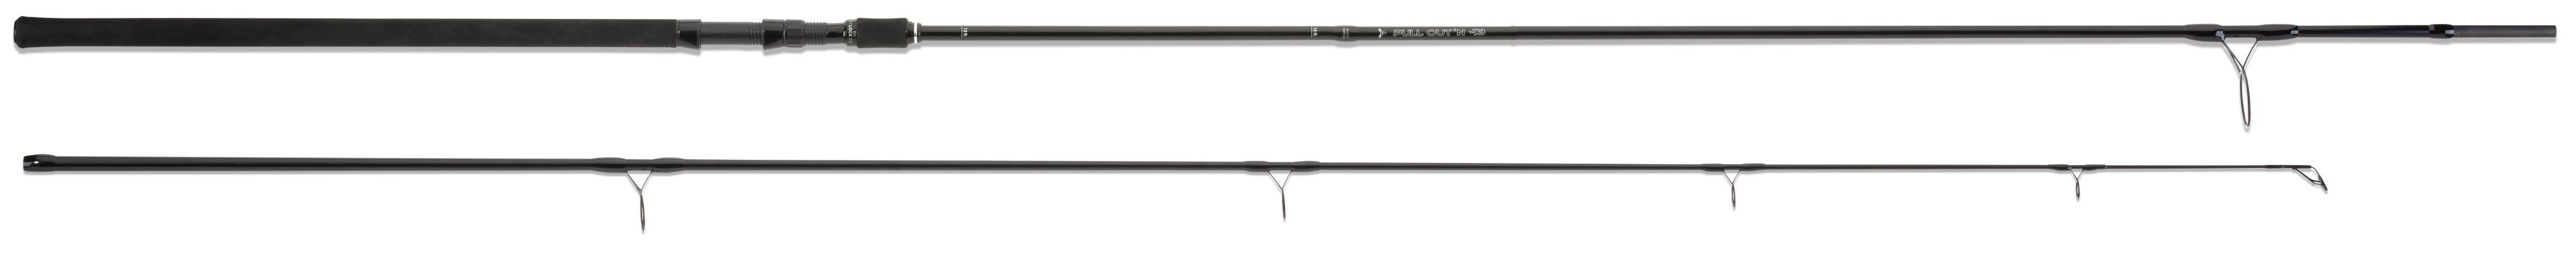 Anaconda prut Xtasy Pull Out'N- Series 12-13 ft/3,25 lb